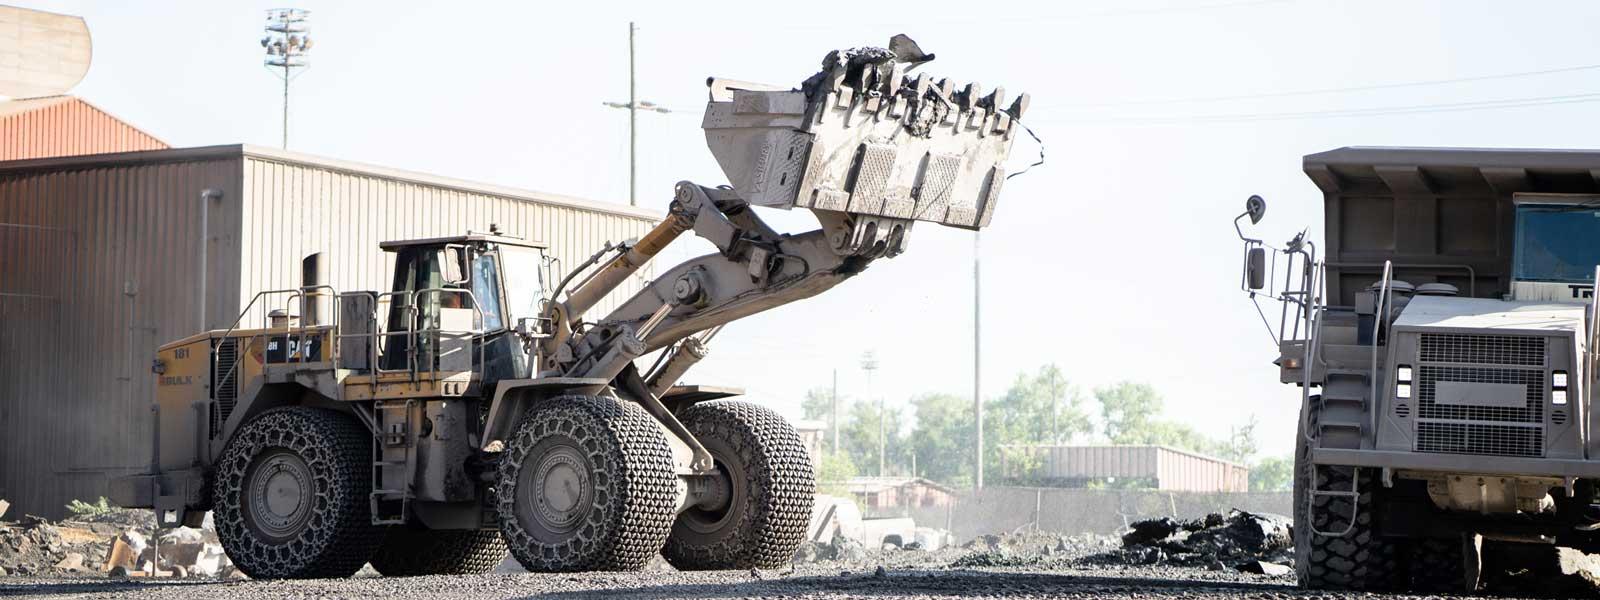 Steel Mill Application Front-end Loader At Job Site